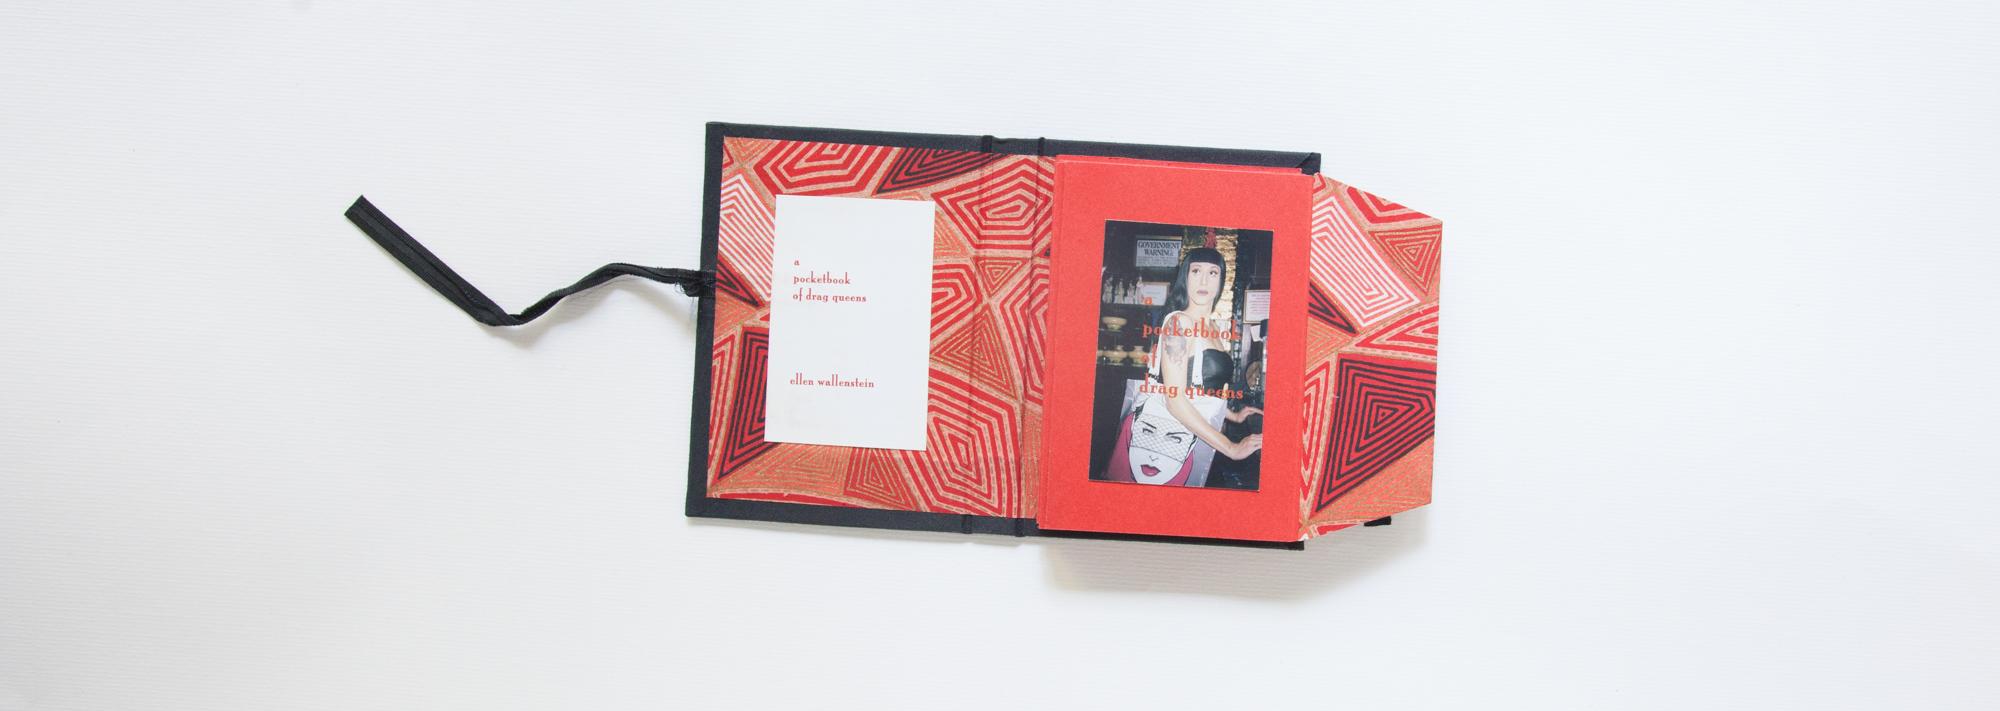 238_POcketbook of Drag Queens (2005)_.jpg